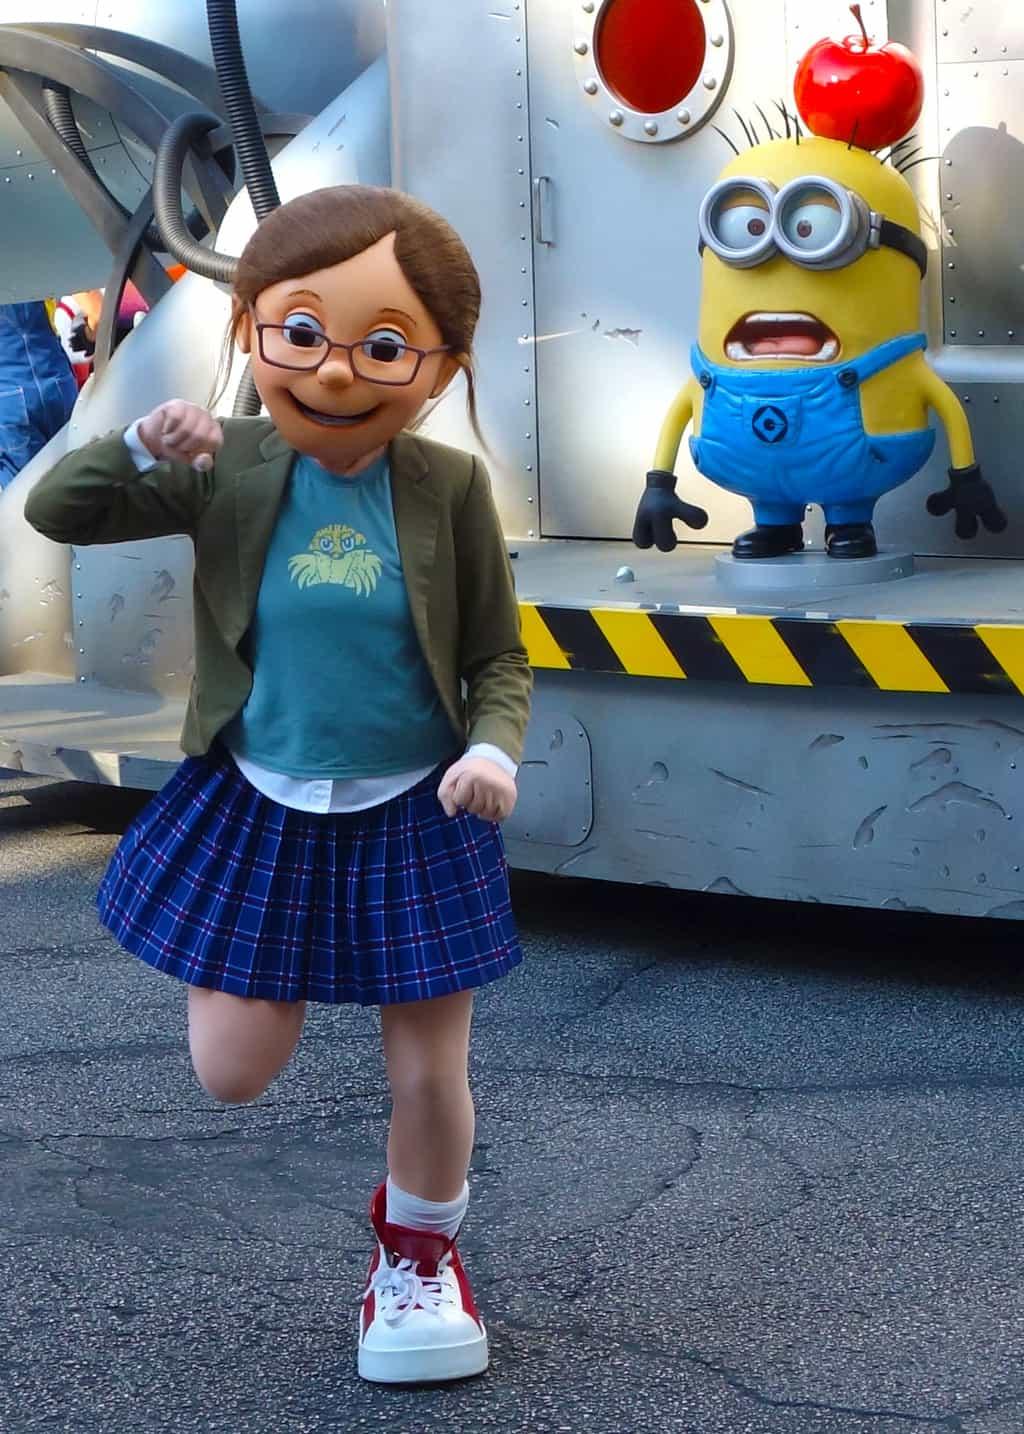 Margo Universal Studios 2012 parade unit